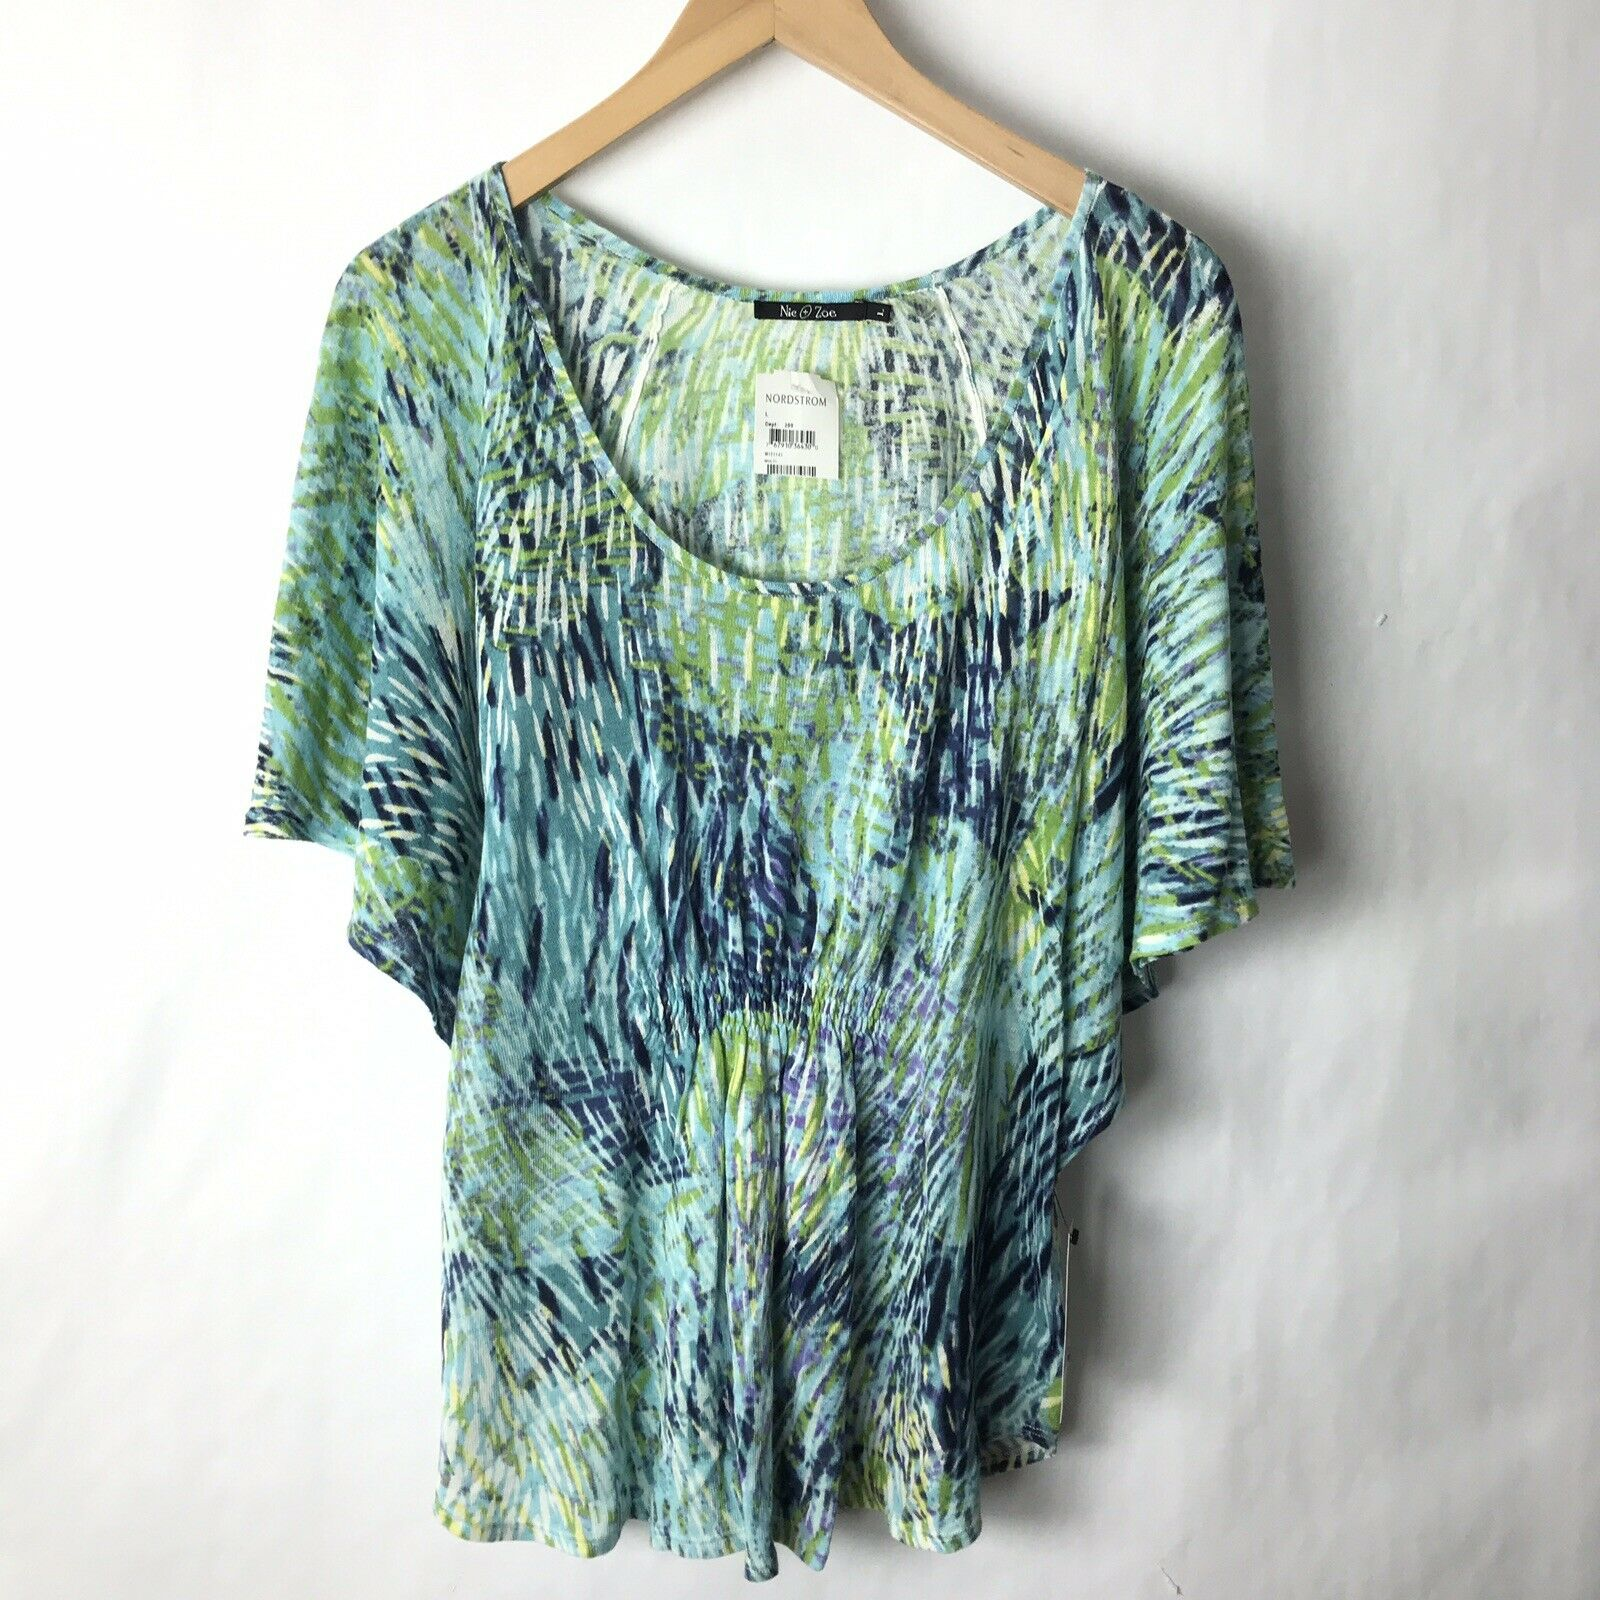 Nic zoe new large Top Dolman Sleeve Linen Knit Blau Grün Tie Dye Print